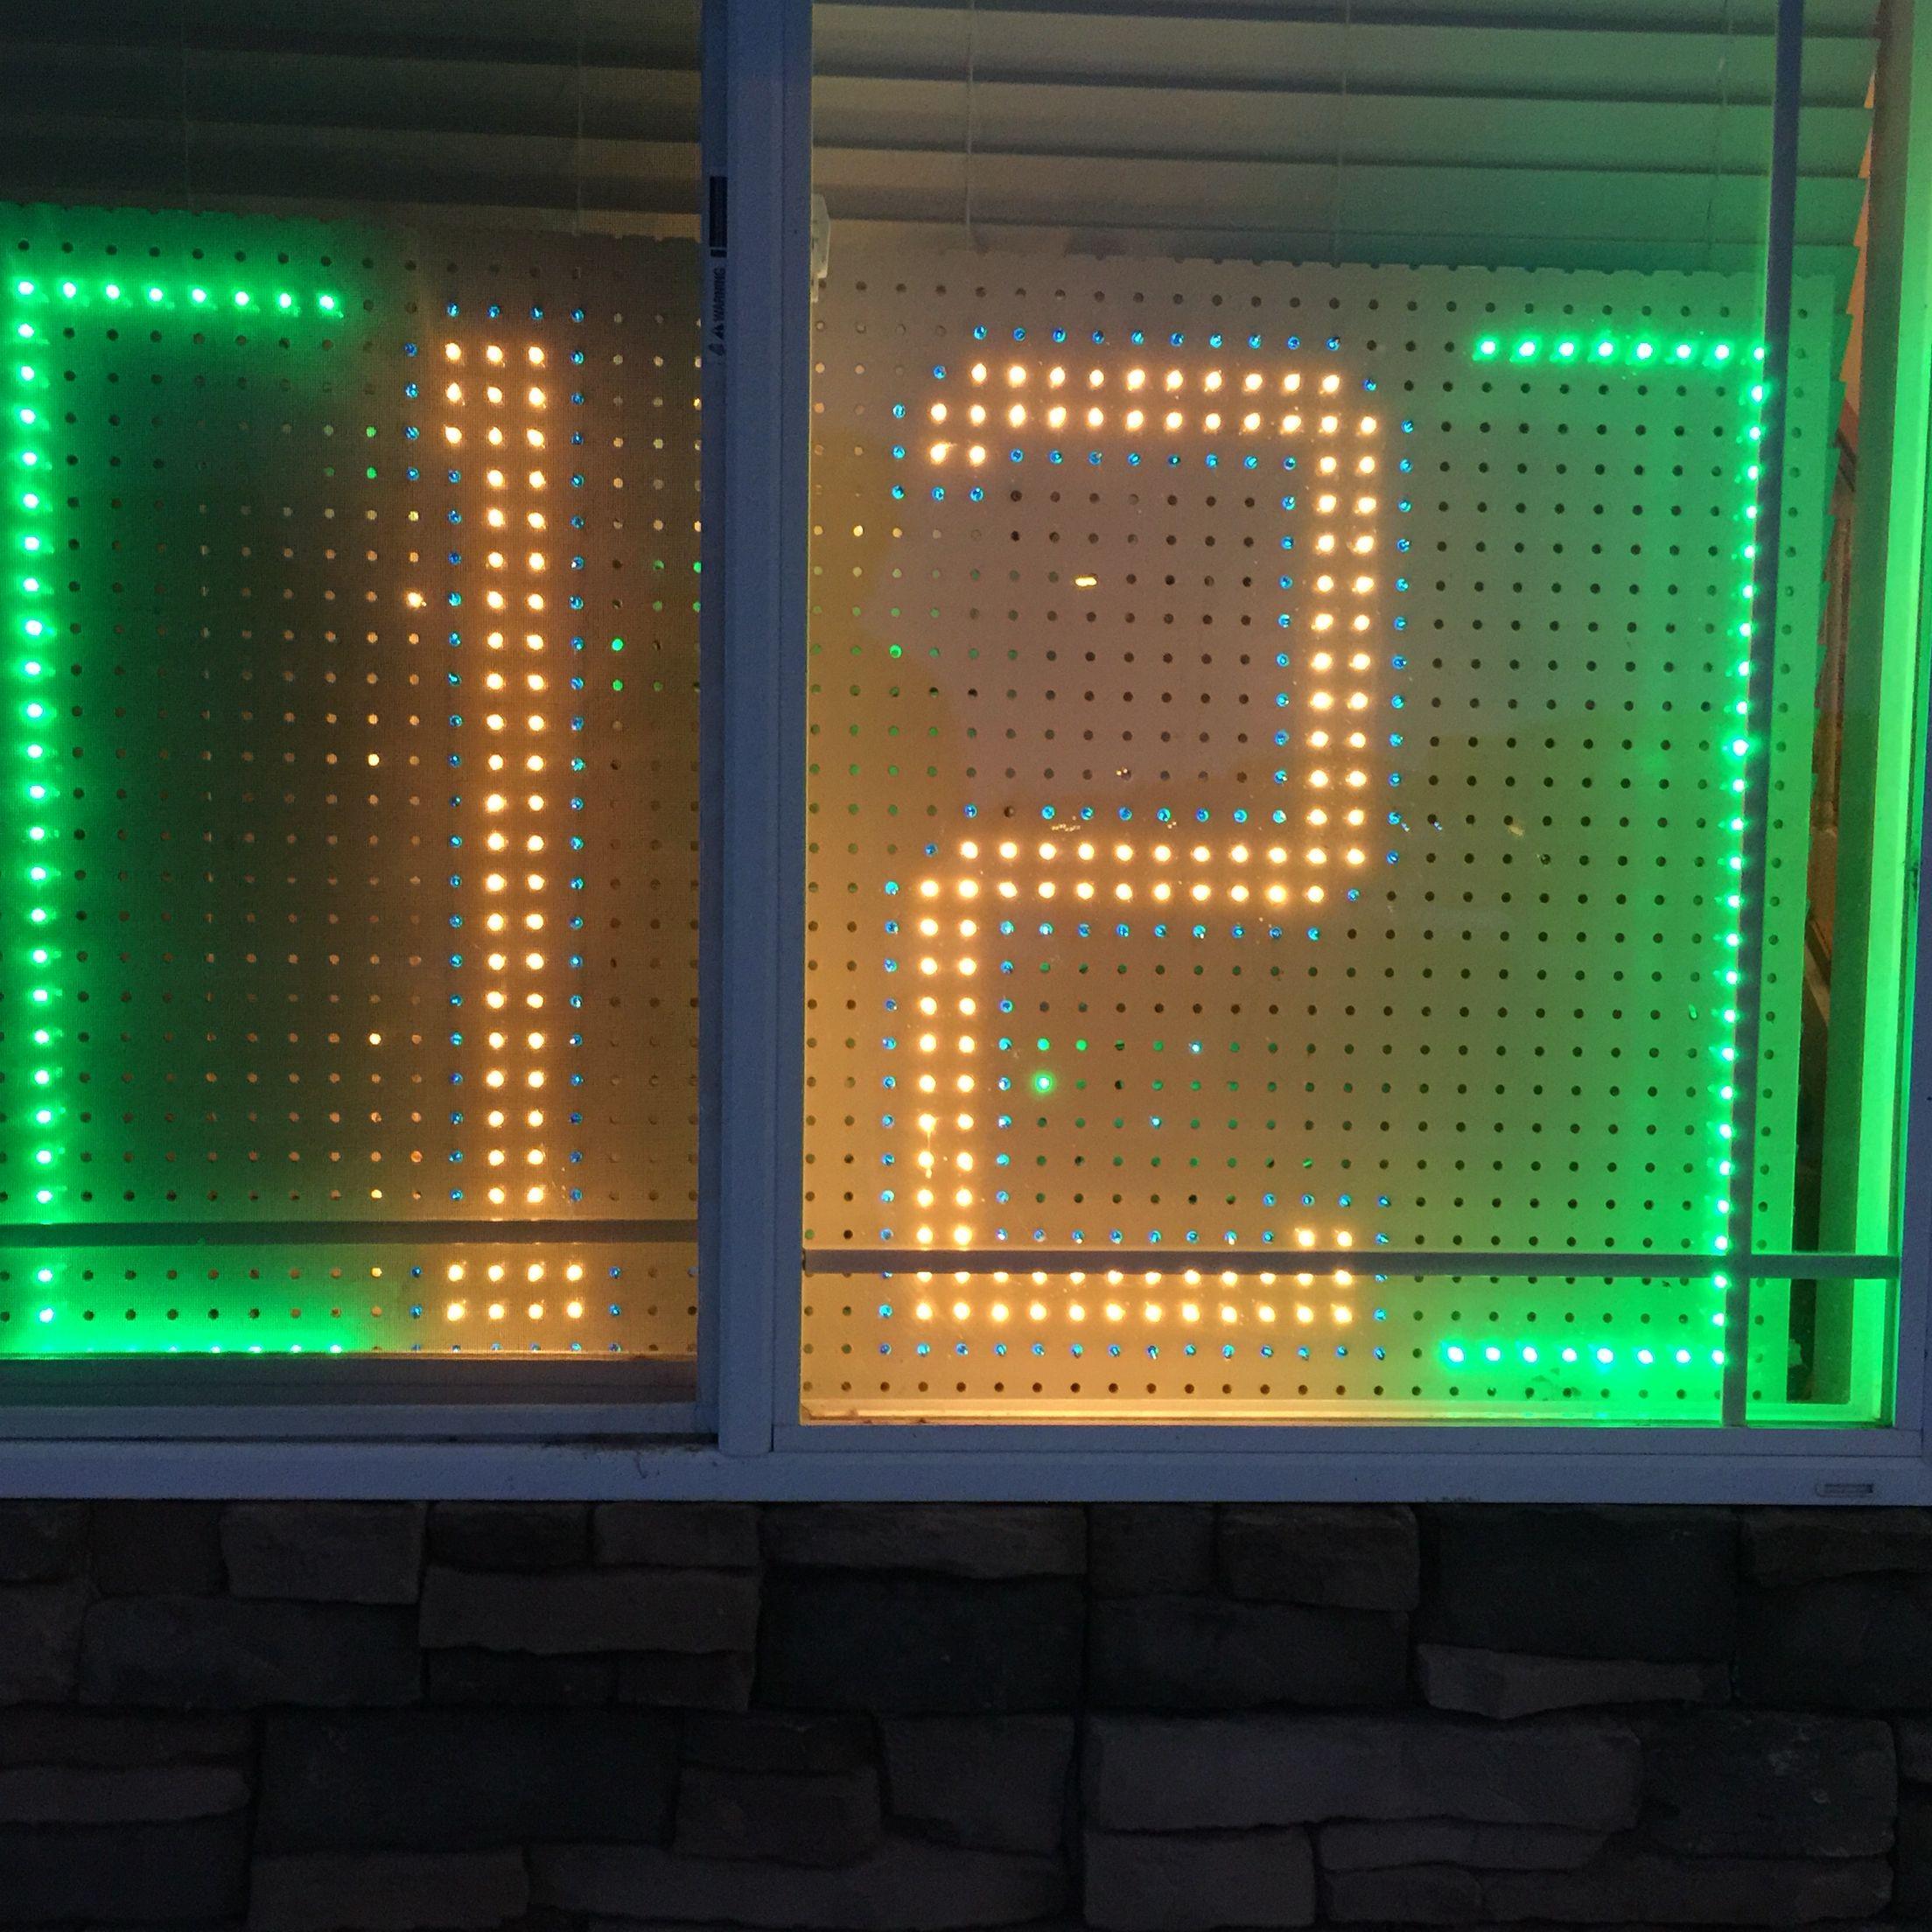 Seahawks Christmas Lights.Homemade 12 Seahawks Fan Sign I Made With Christmas Lights